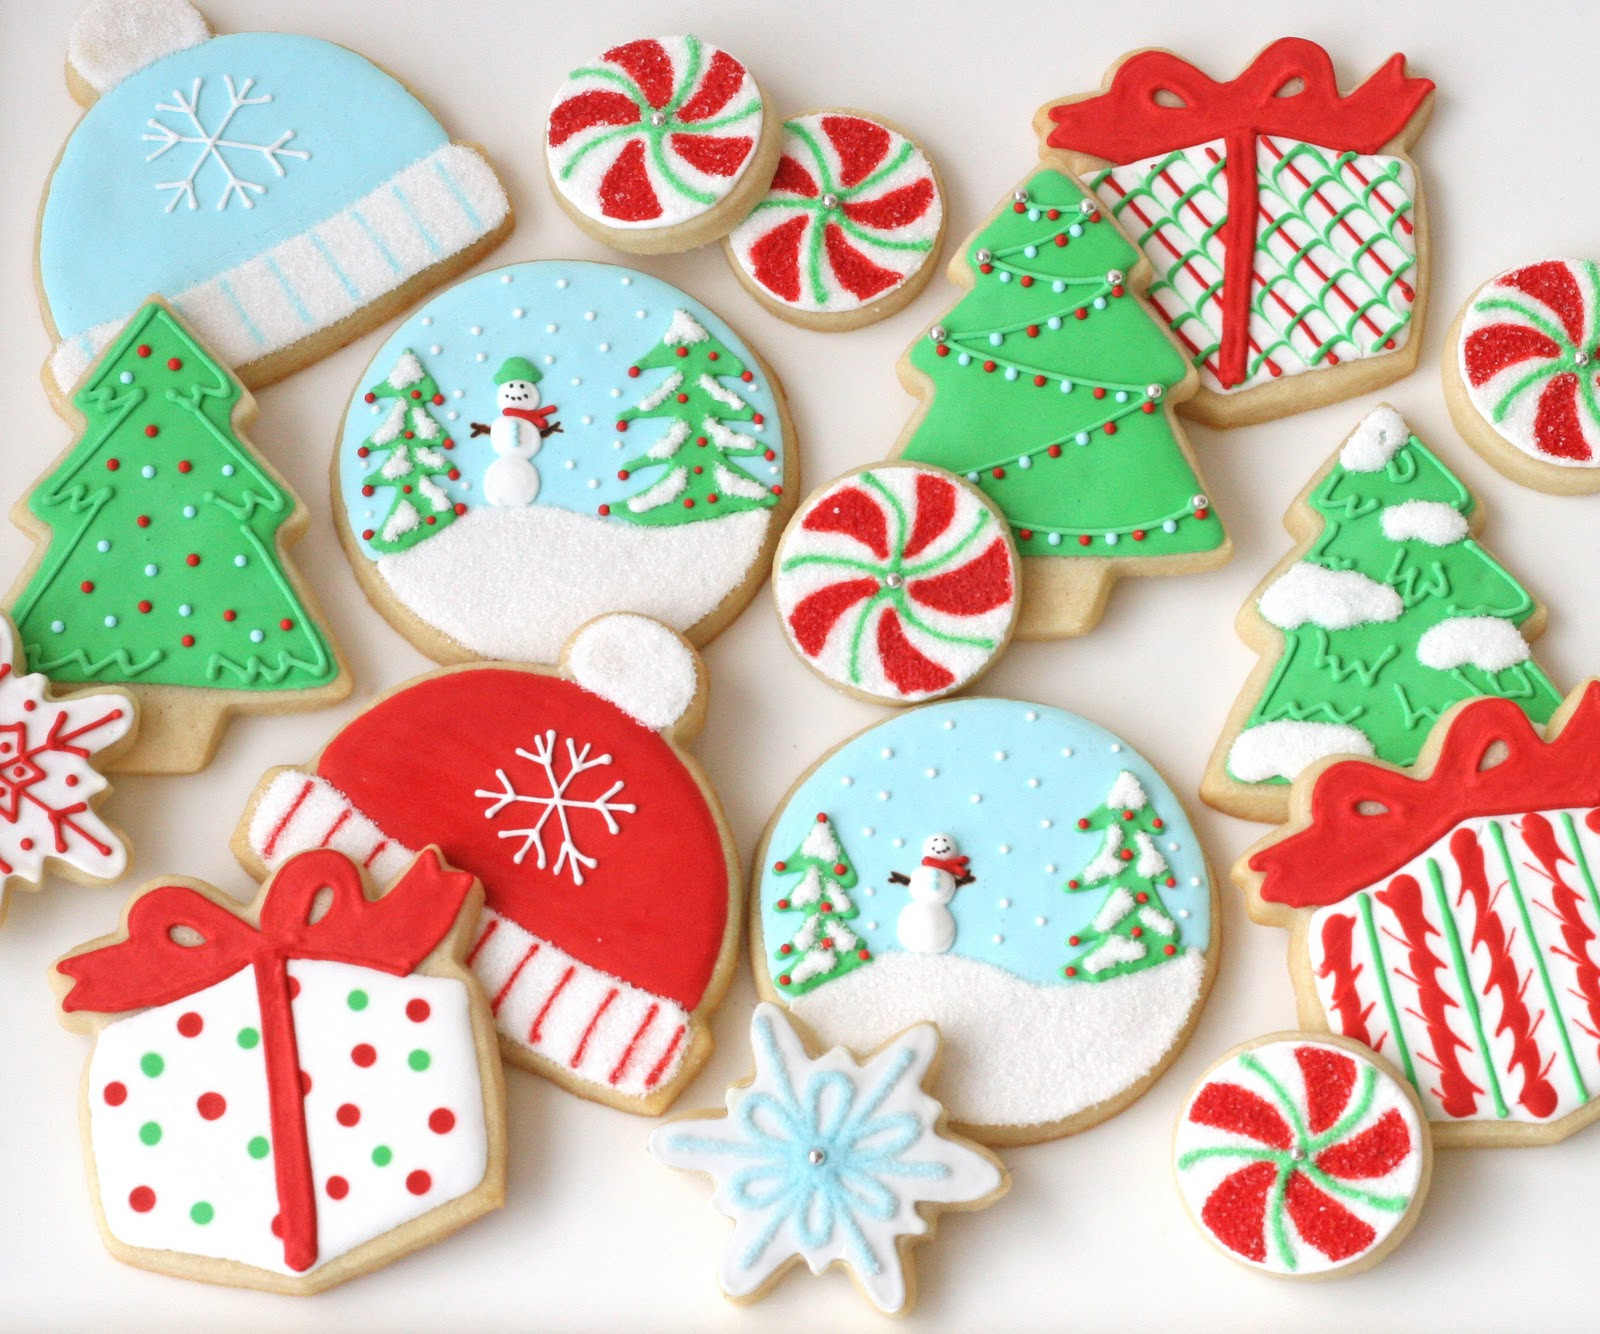 Christmas Sugar Cookies Recipes  Christmas Cookies Galore Glorious Treats